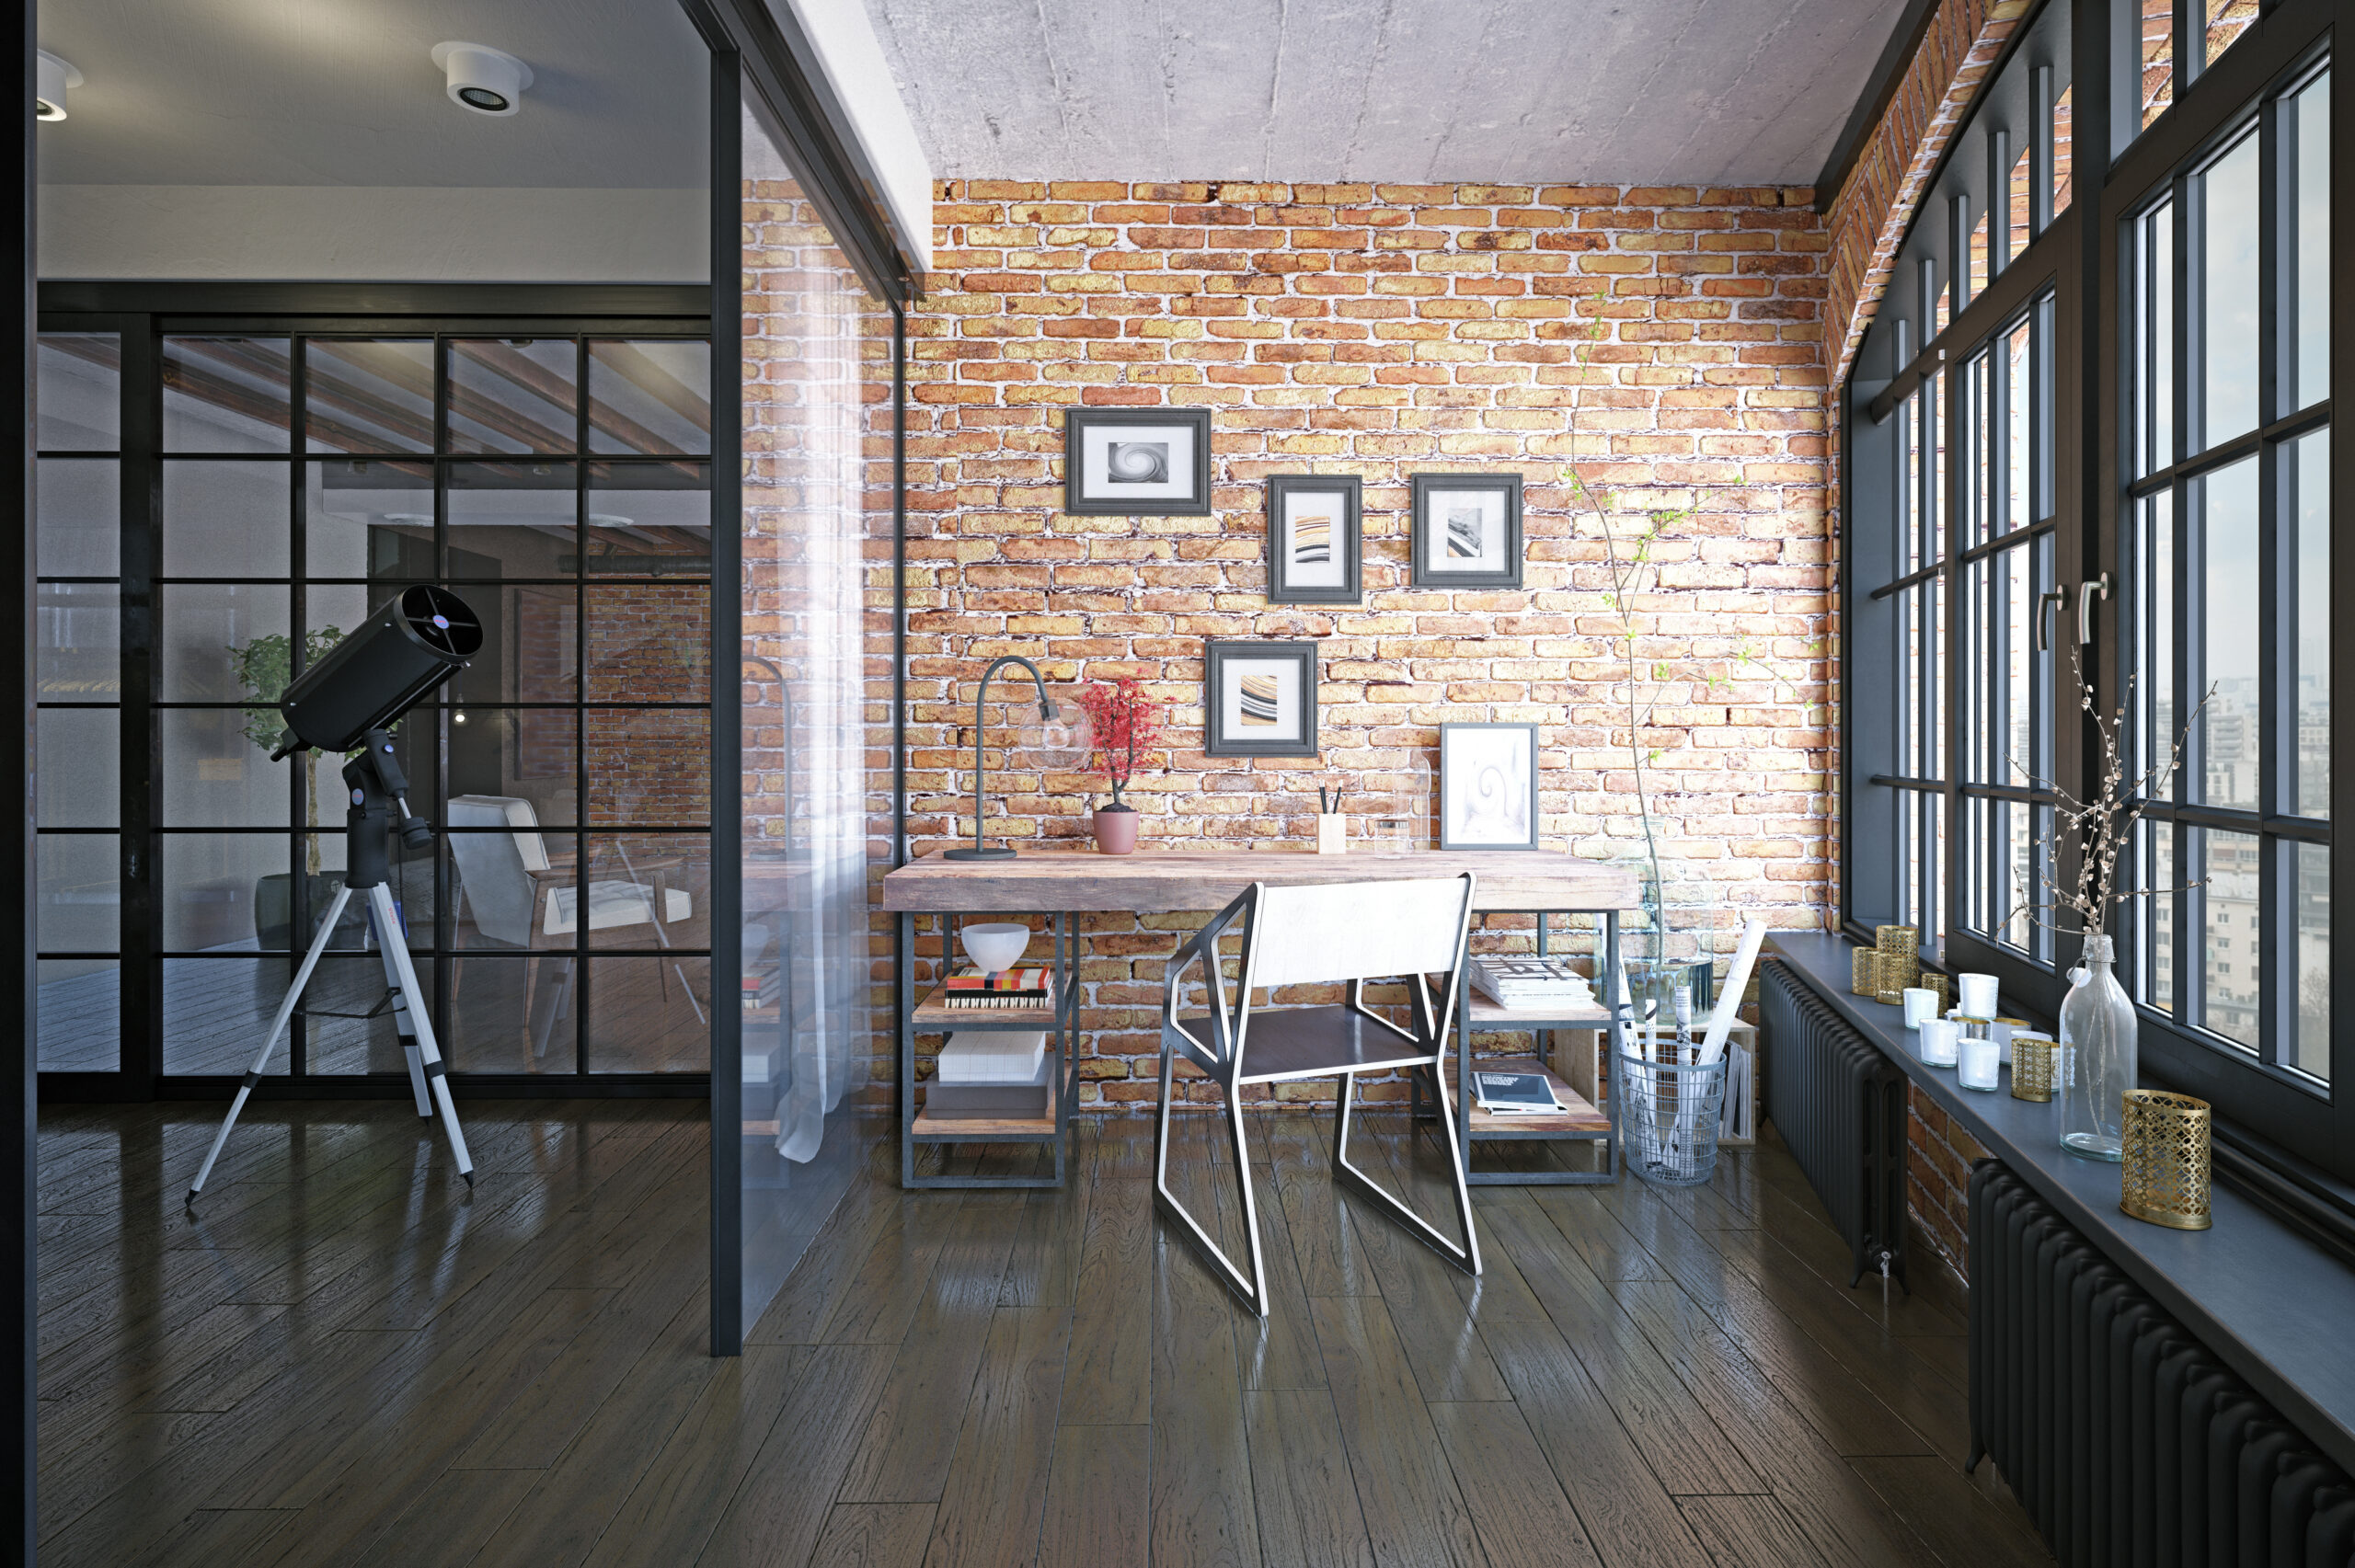 modern loft study interior. 3d rendering drsign project